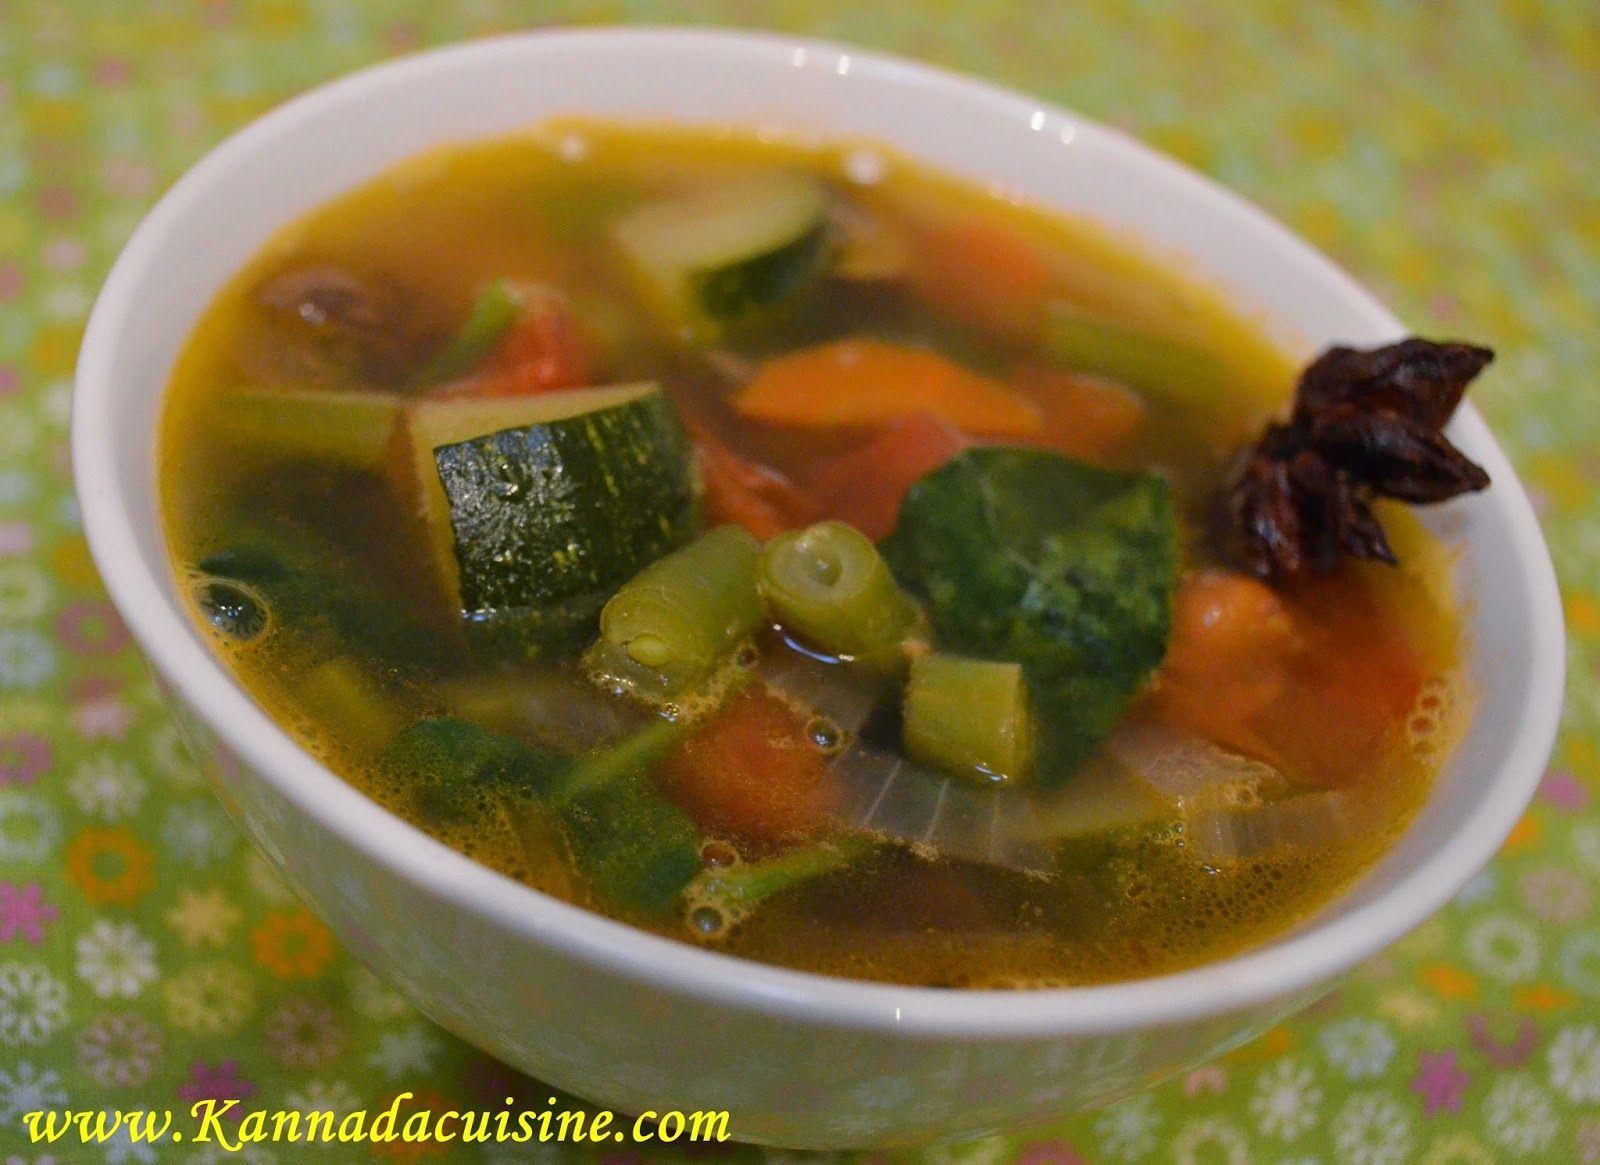 Kannada cuisine vegetable soup karnataka veg manglore udipi recipes from karnataka forumfinder Images